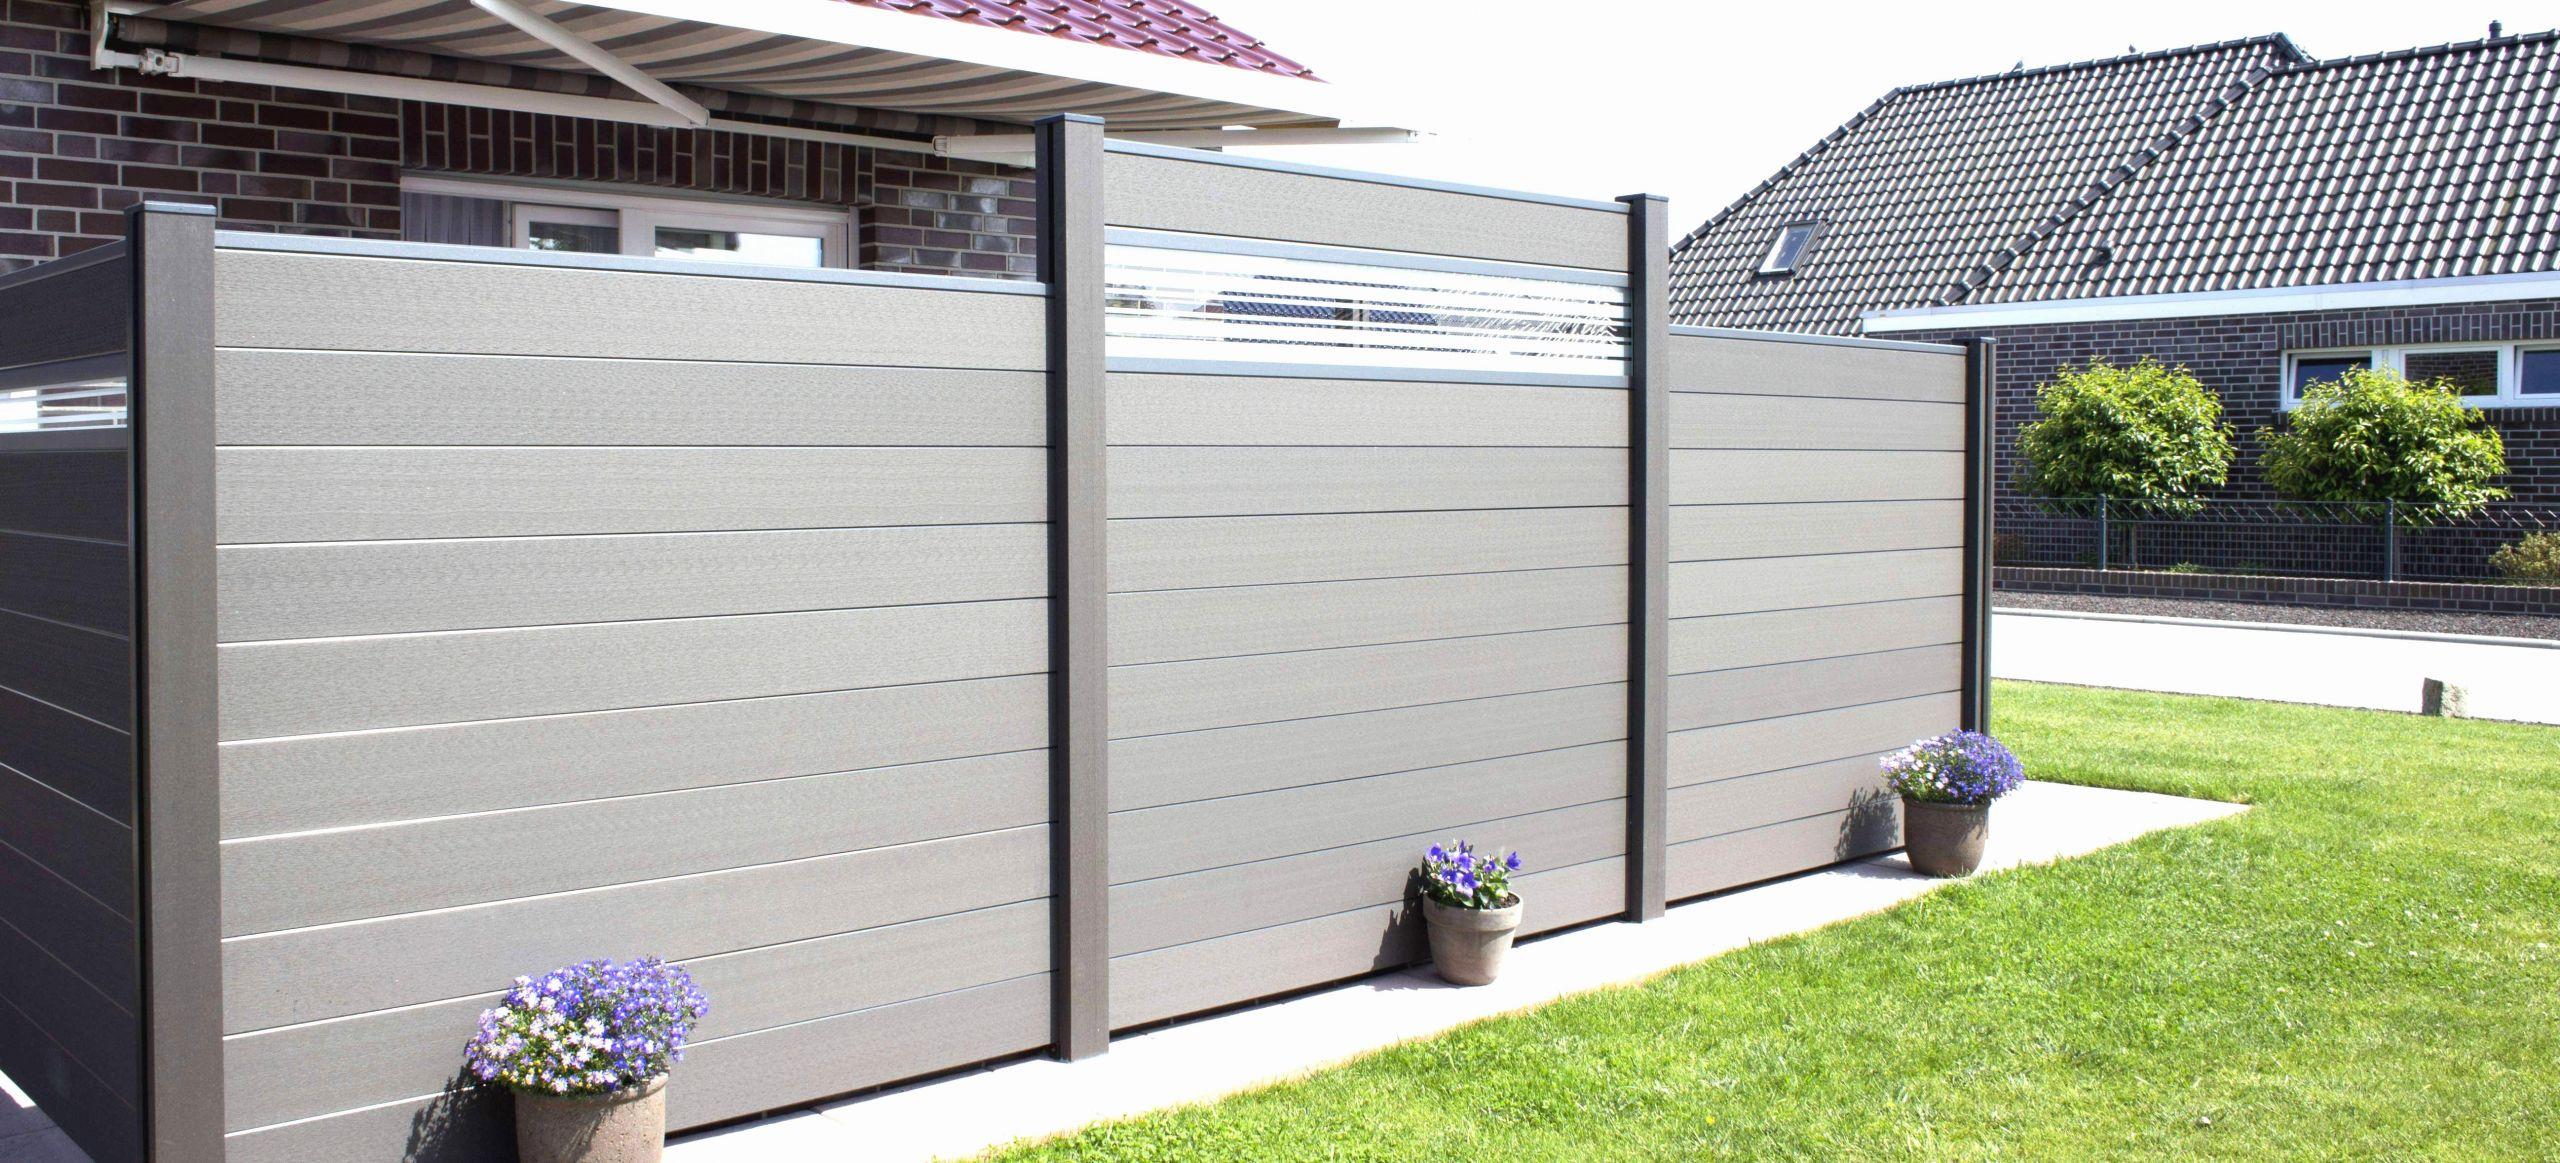 metallzaun garten frisch garden design ideas beautiful raised garden design ideas of metallzaun garten scaled